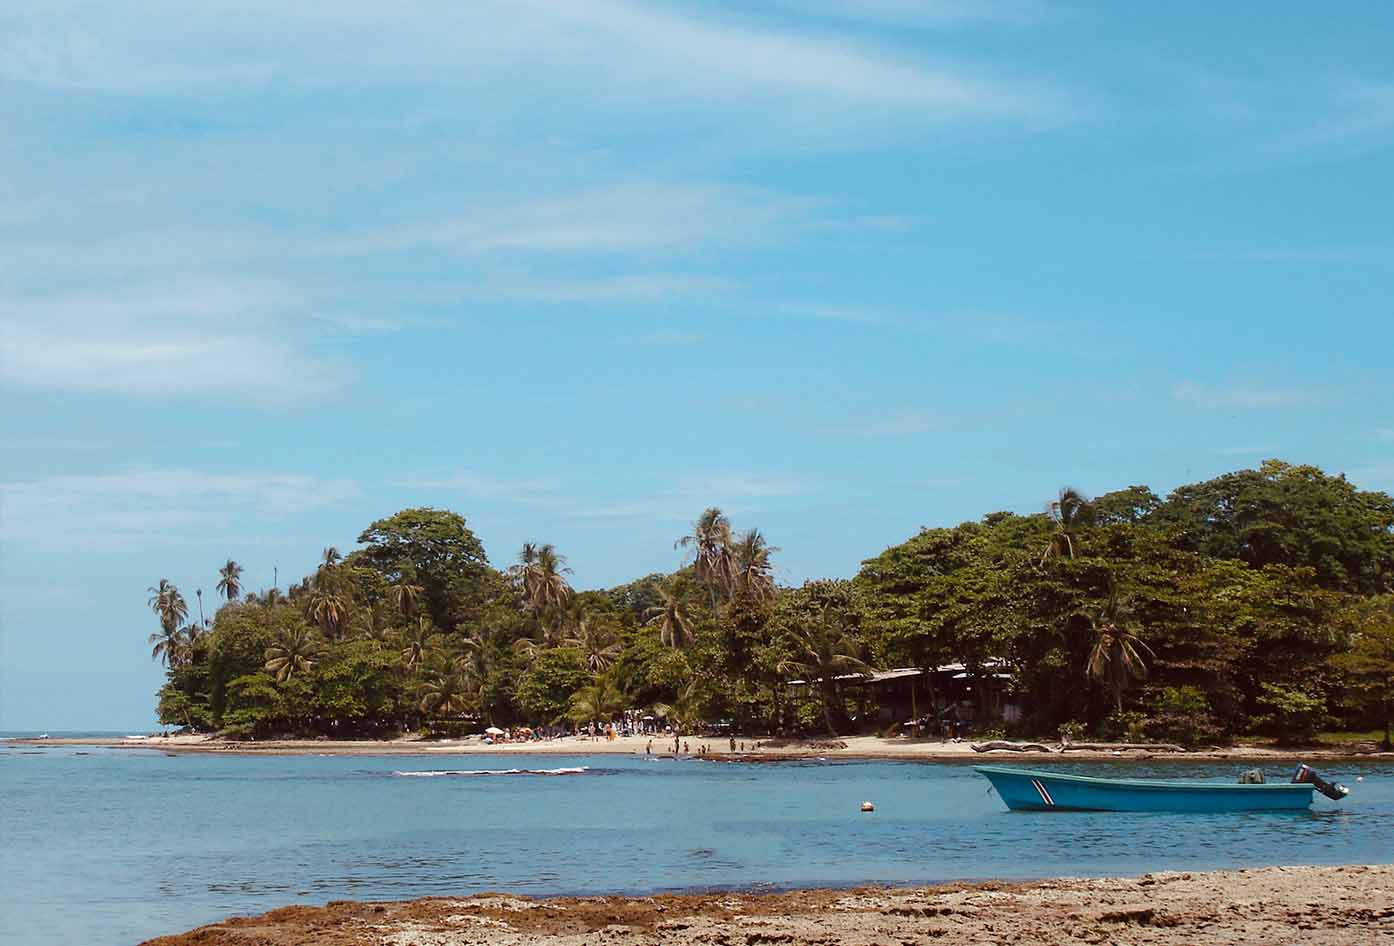 costa rica or nicaragua